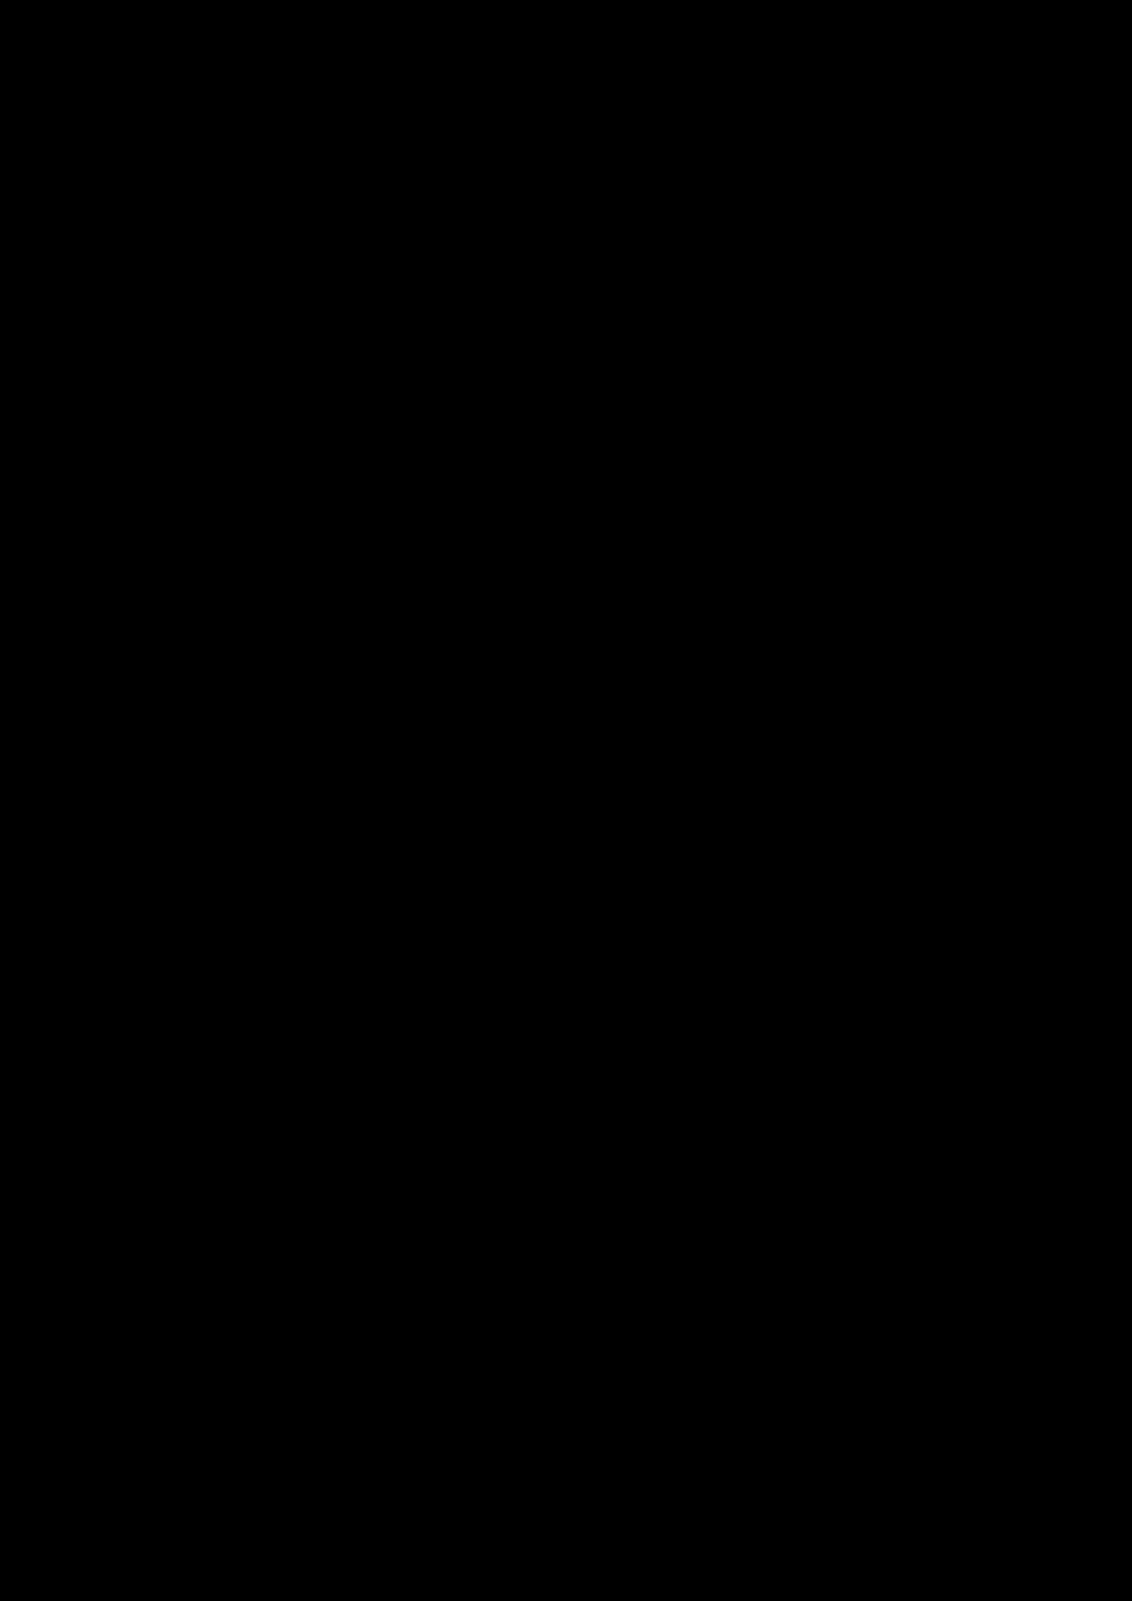 Belyiy sokol slide, Image 97